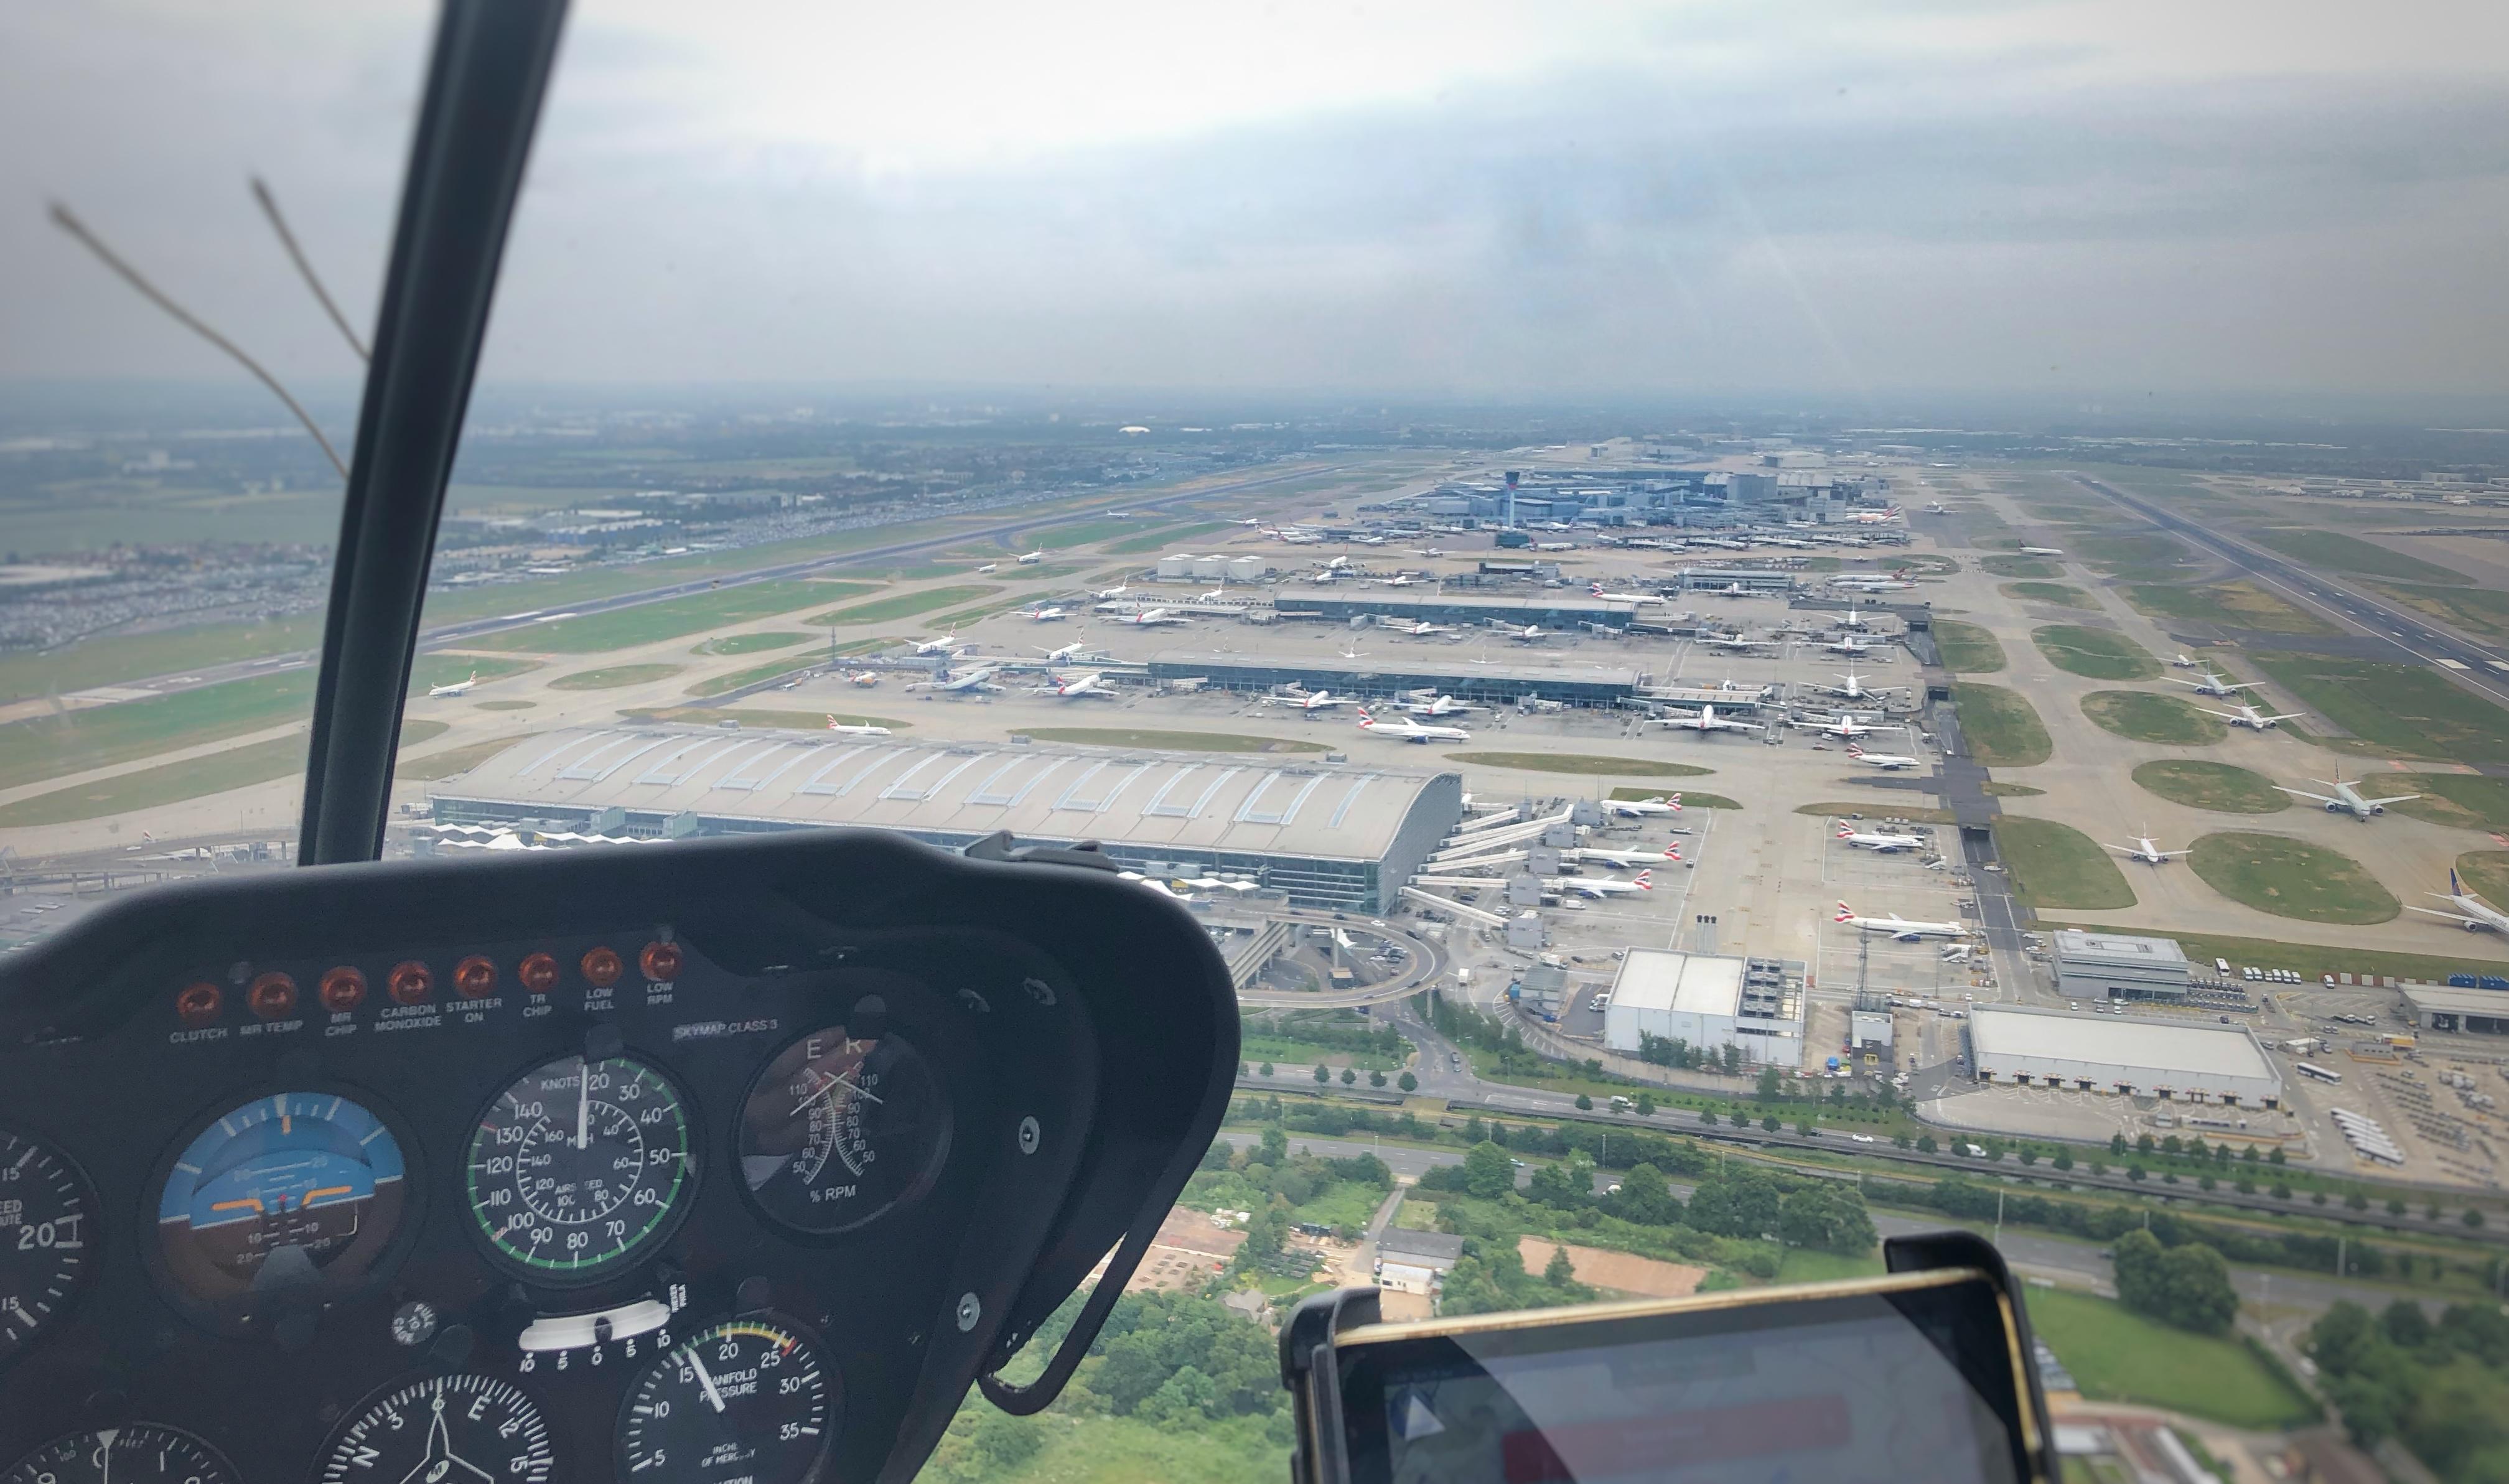 Heathrow 09 crossing